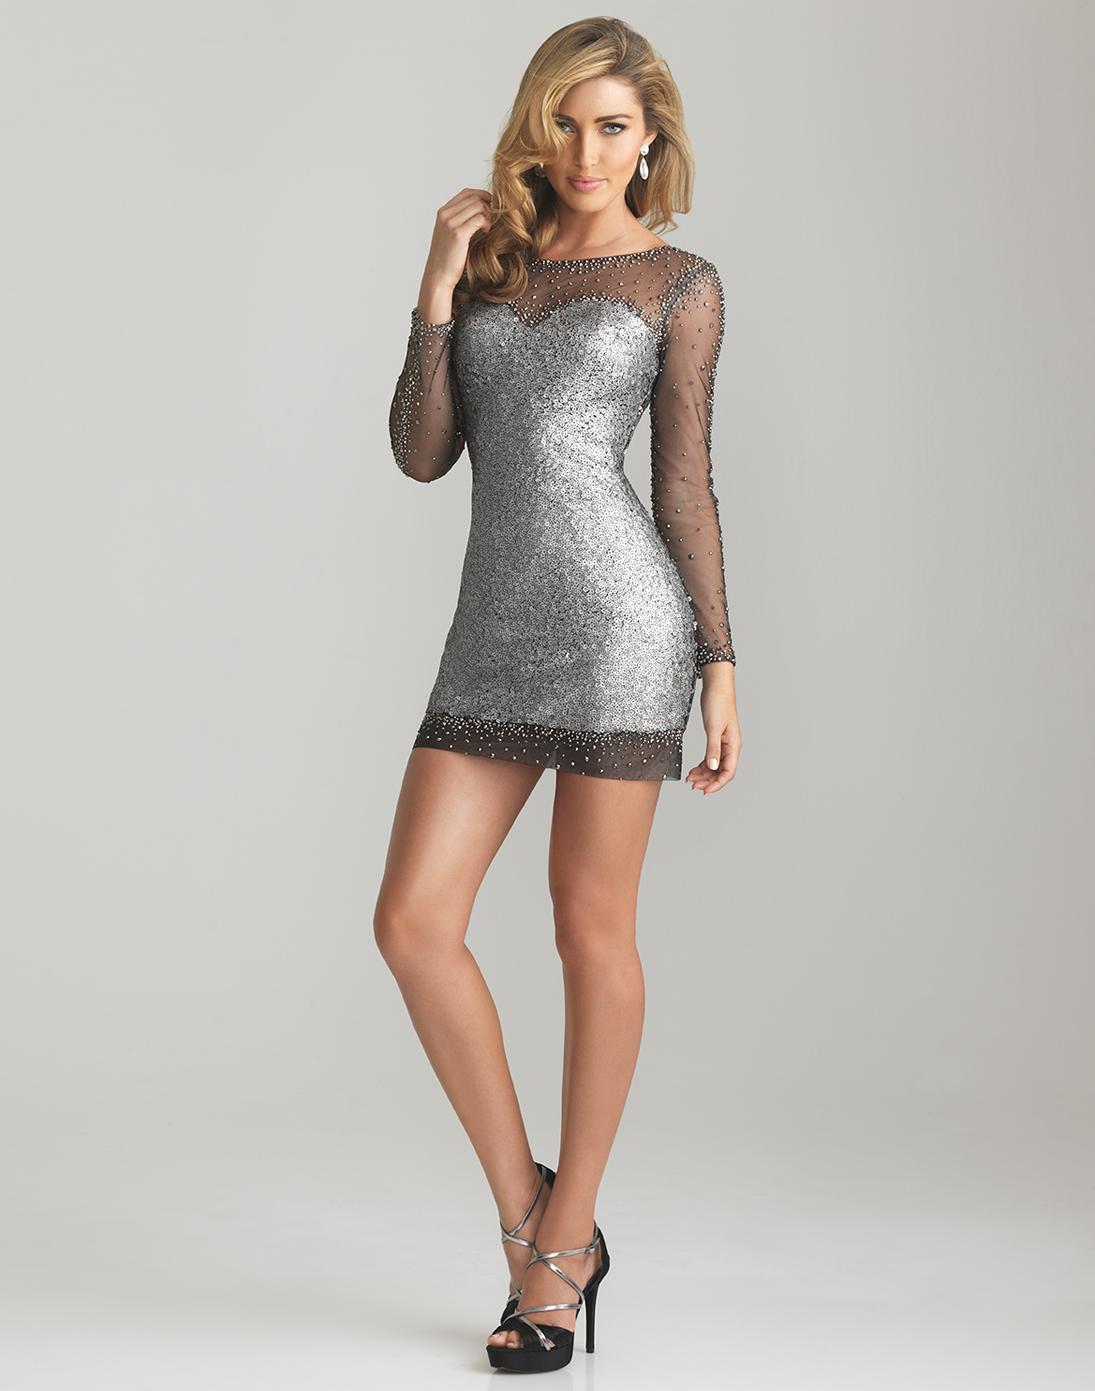 2013 Popular Senior Prom Dresses Wedding Inspiration Trends